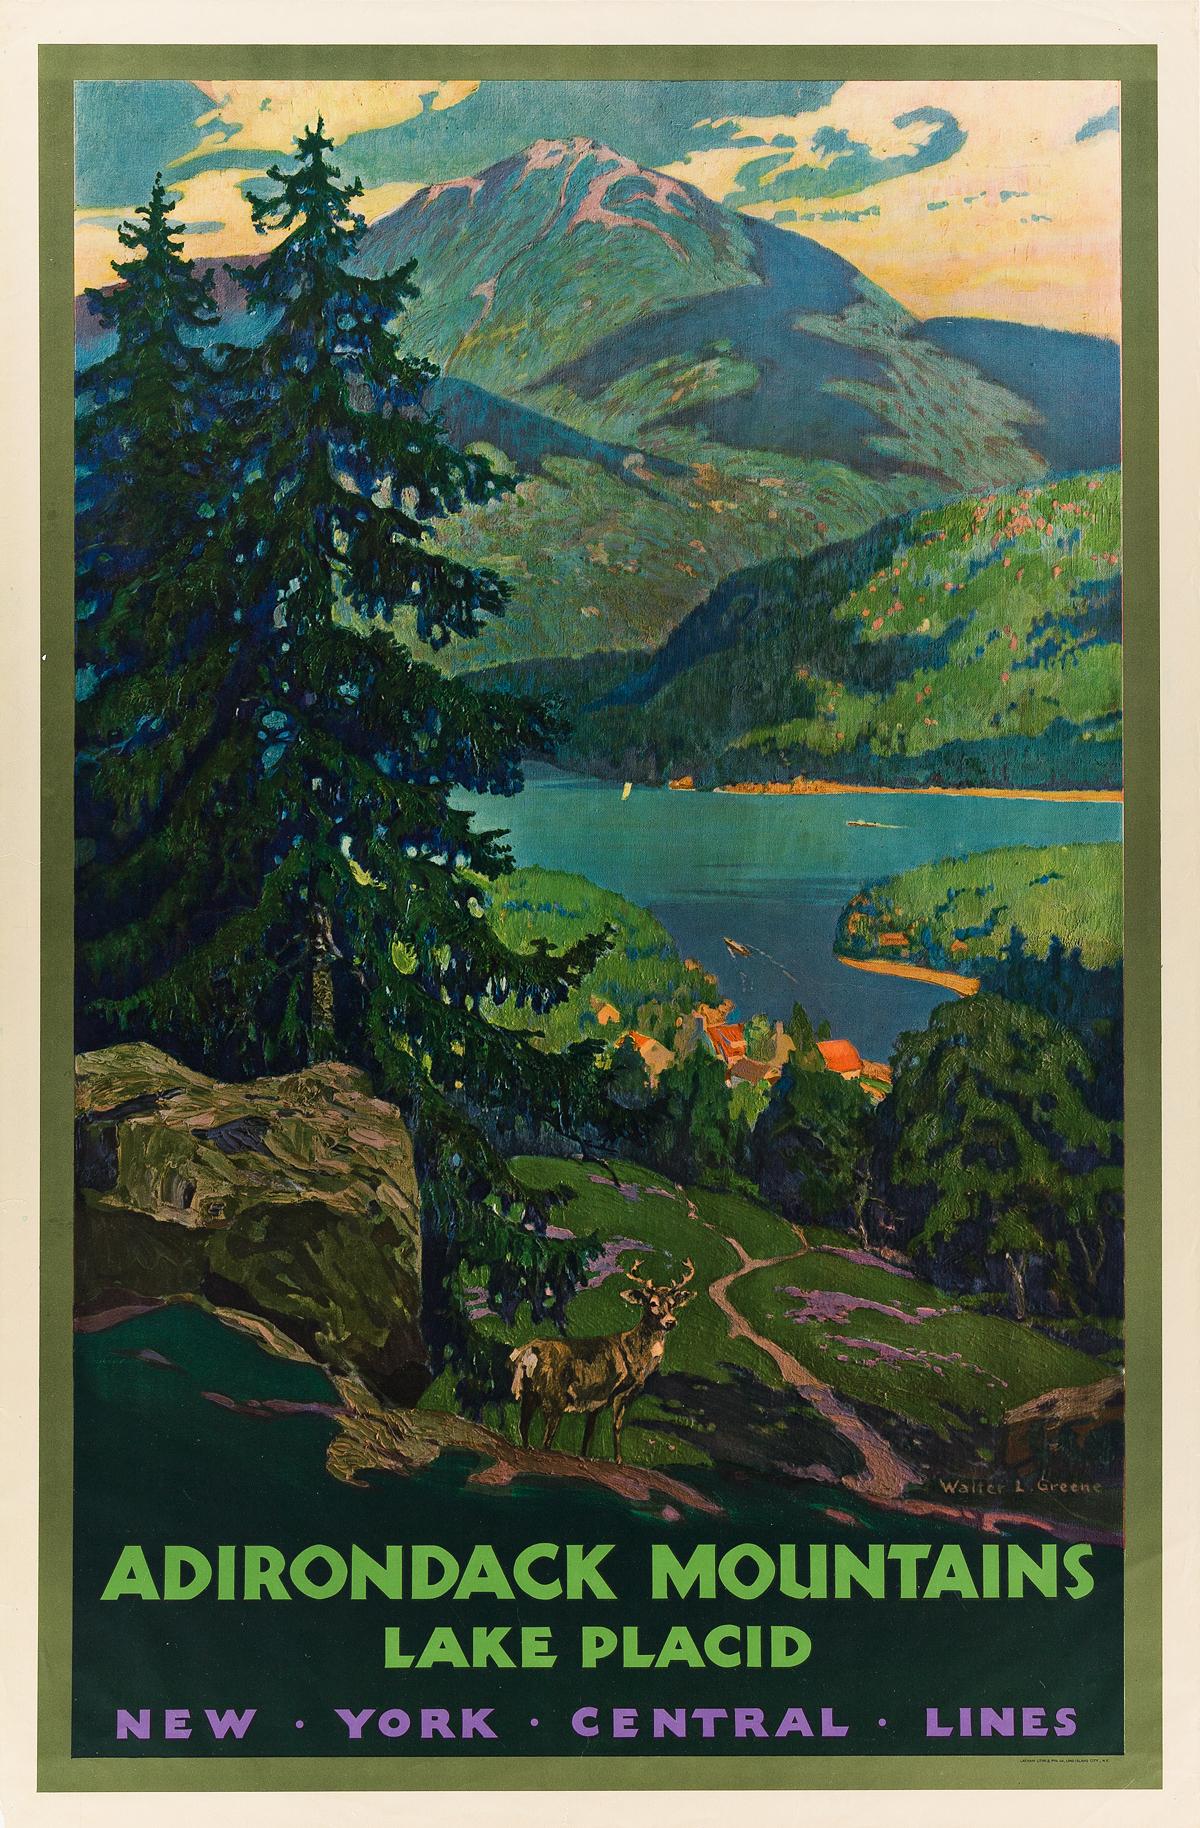 WALTER-L-GREENE-(1870-1956)-ADIRONDACK-MOUNTAINS--LAKE-PLACID-1930-40x26-inches-101x66-cm-Latham-Litho-and-Printing-Co-New-Yor